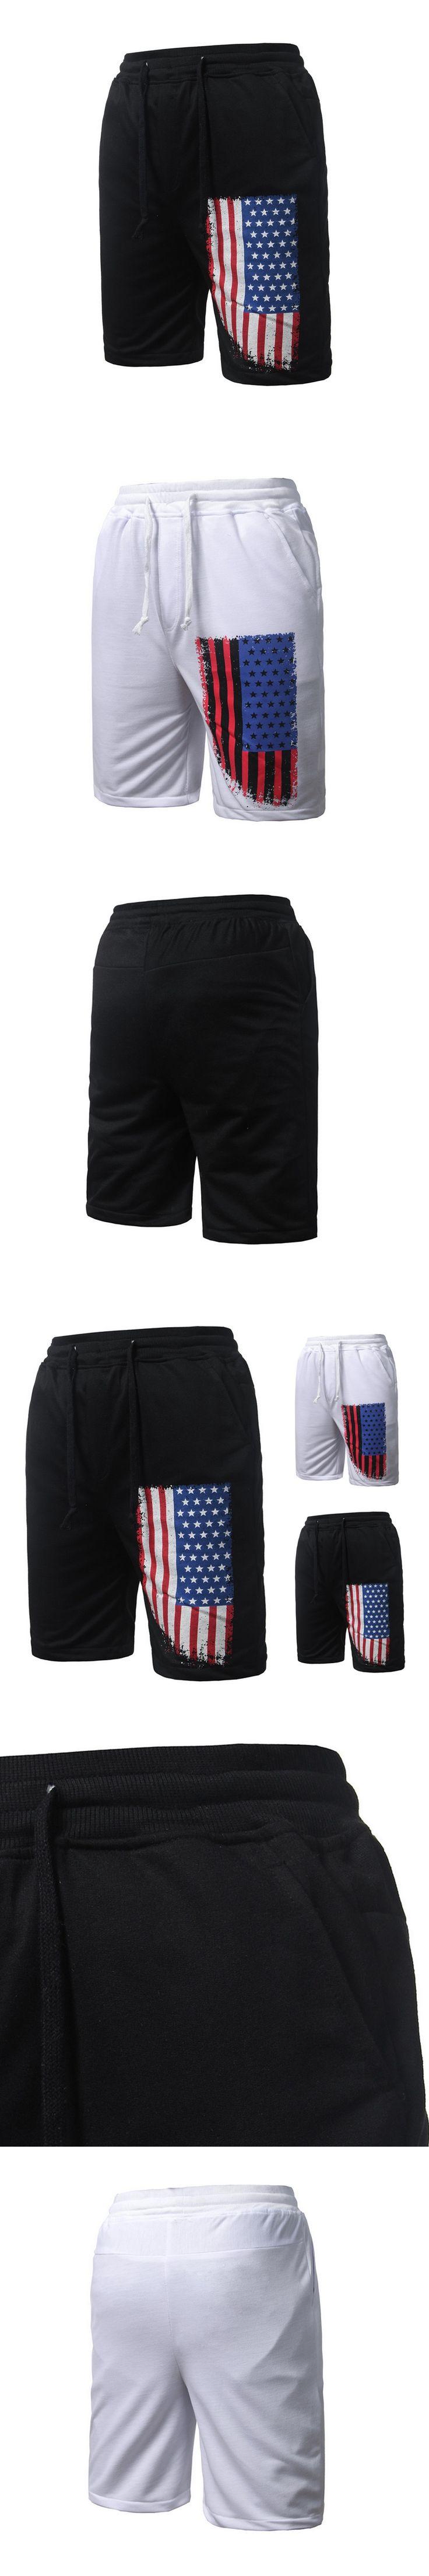 Summer Men Beach Pants Leisure Trend Printed Men\'s Fitness  FS99